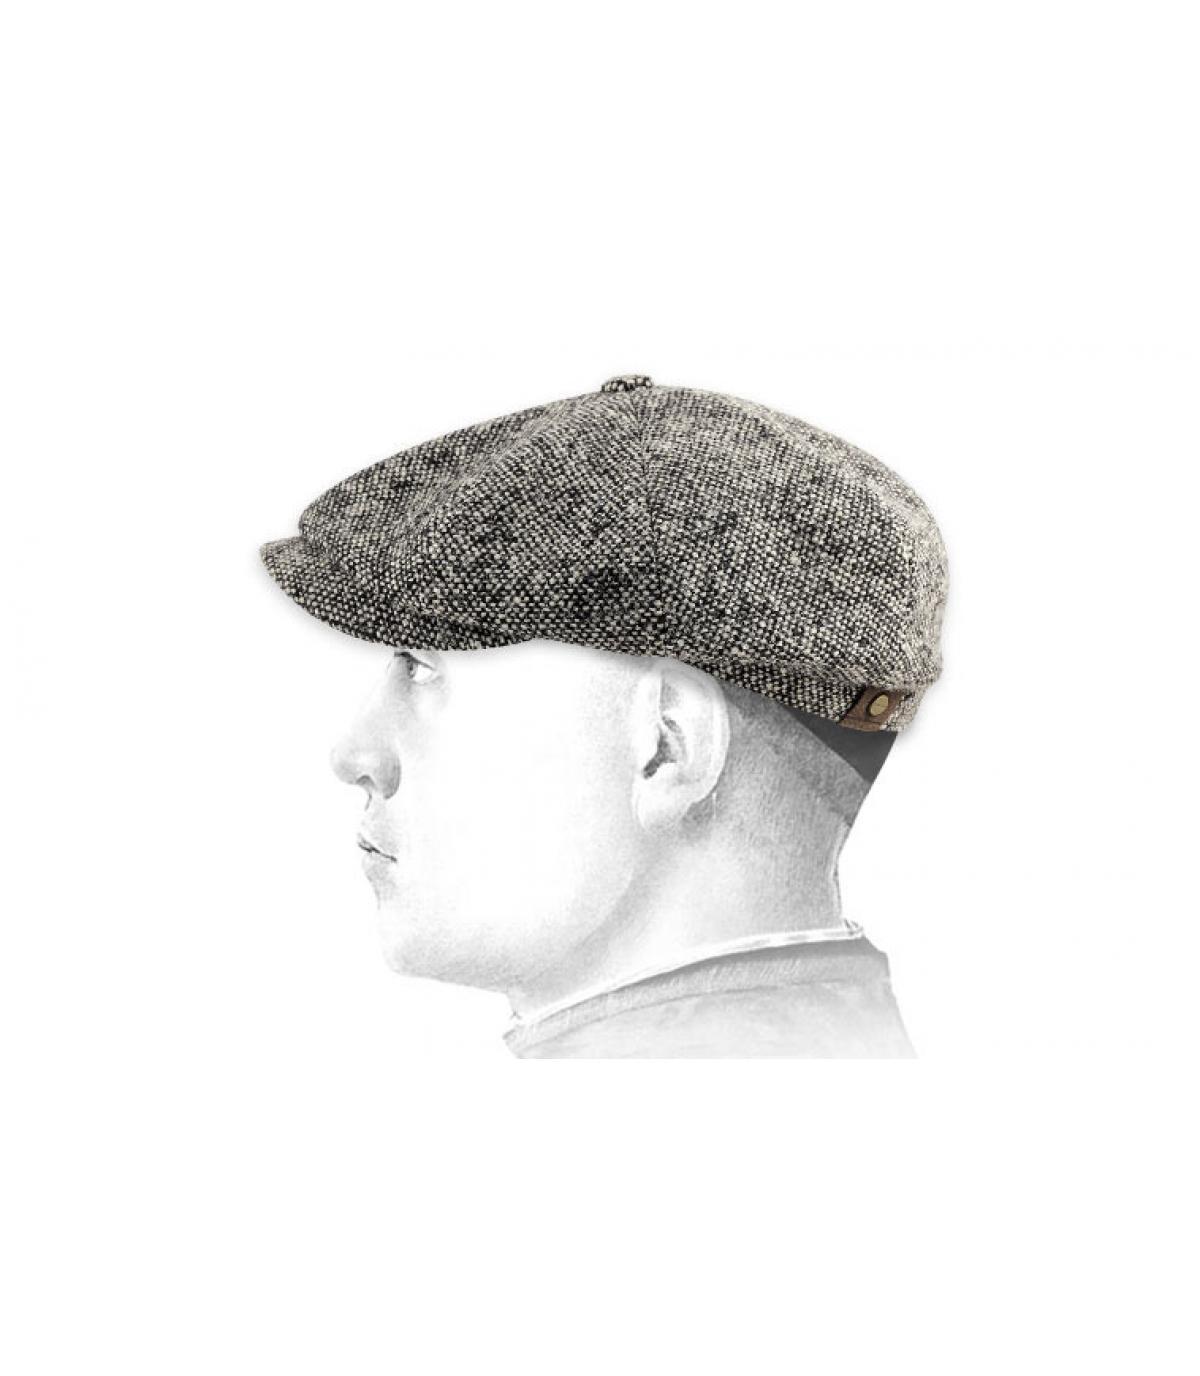 Dettagli Hatteras Donegal gris - image 3